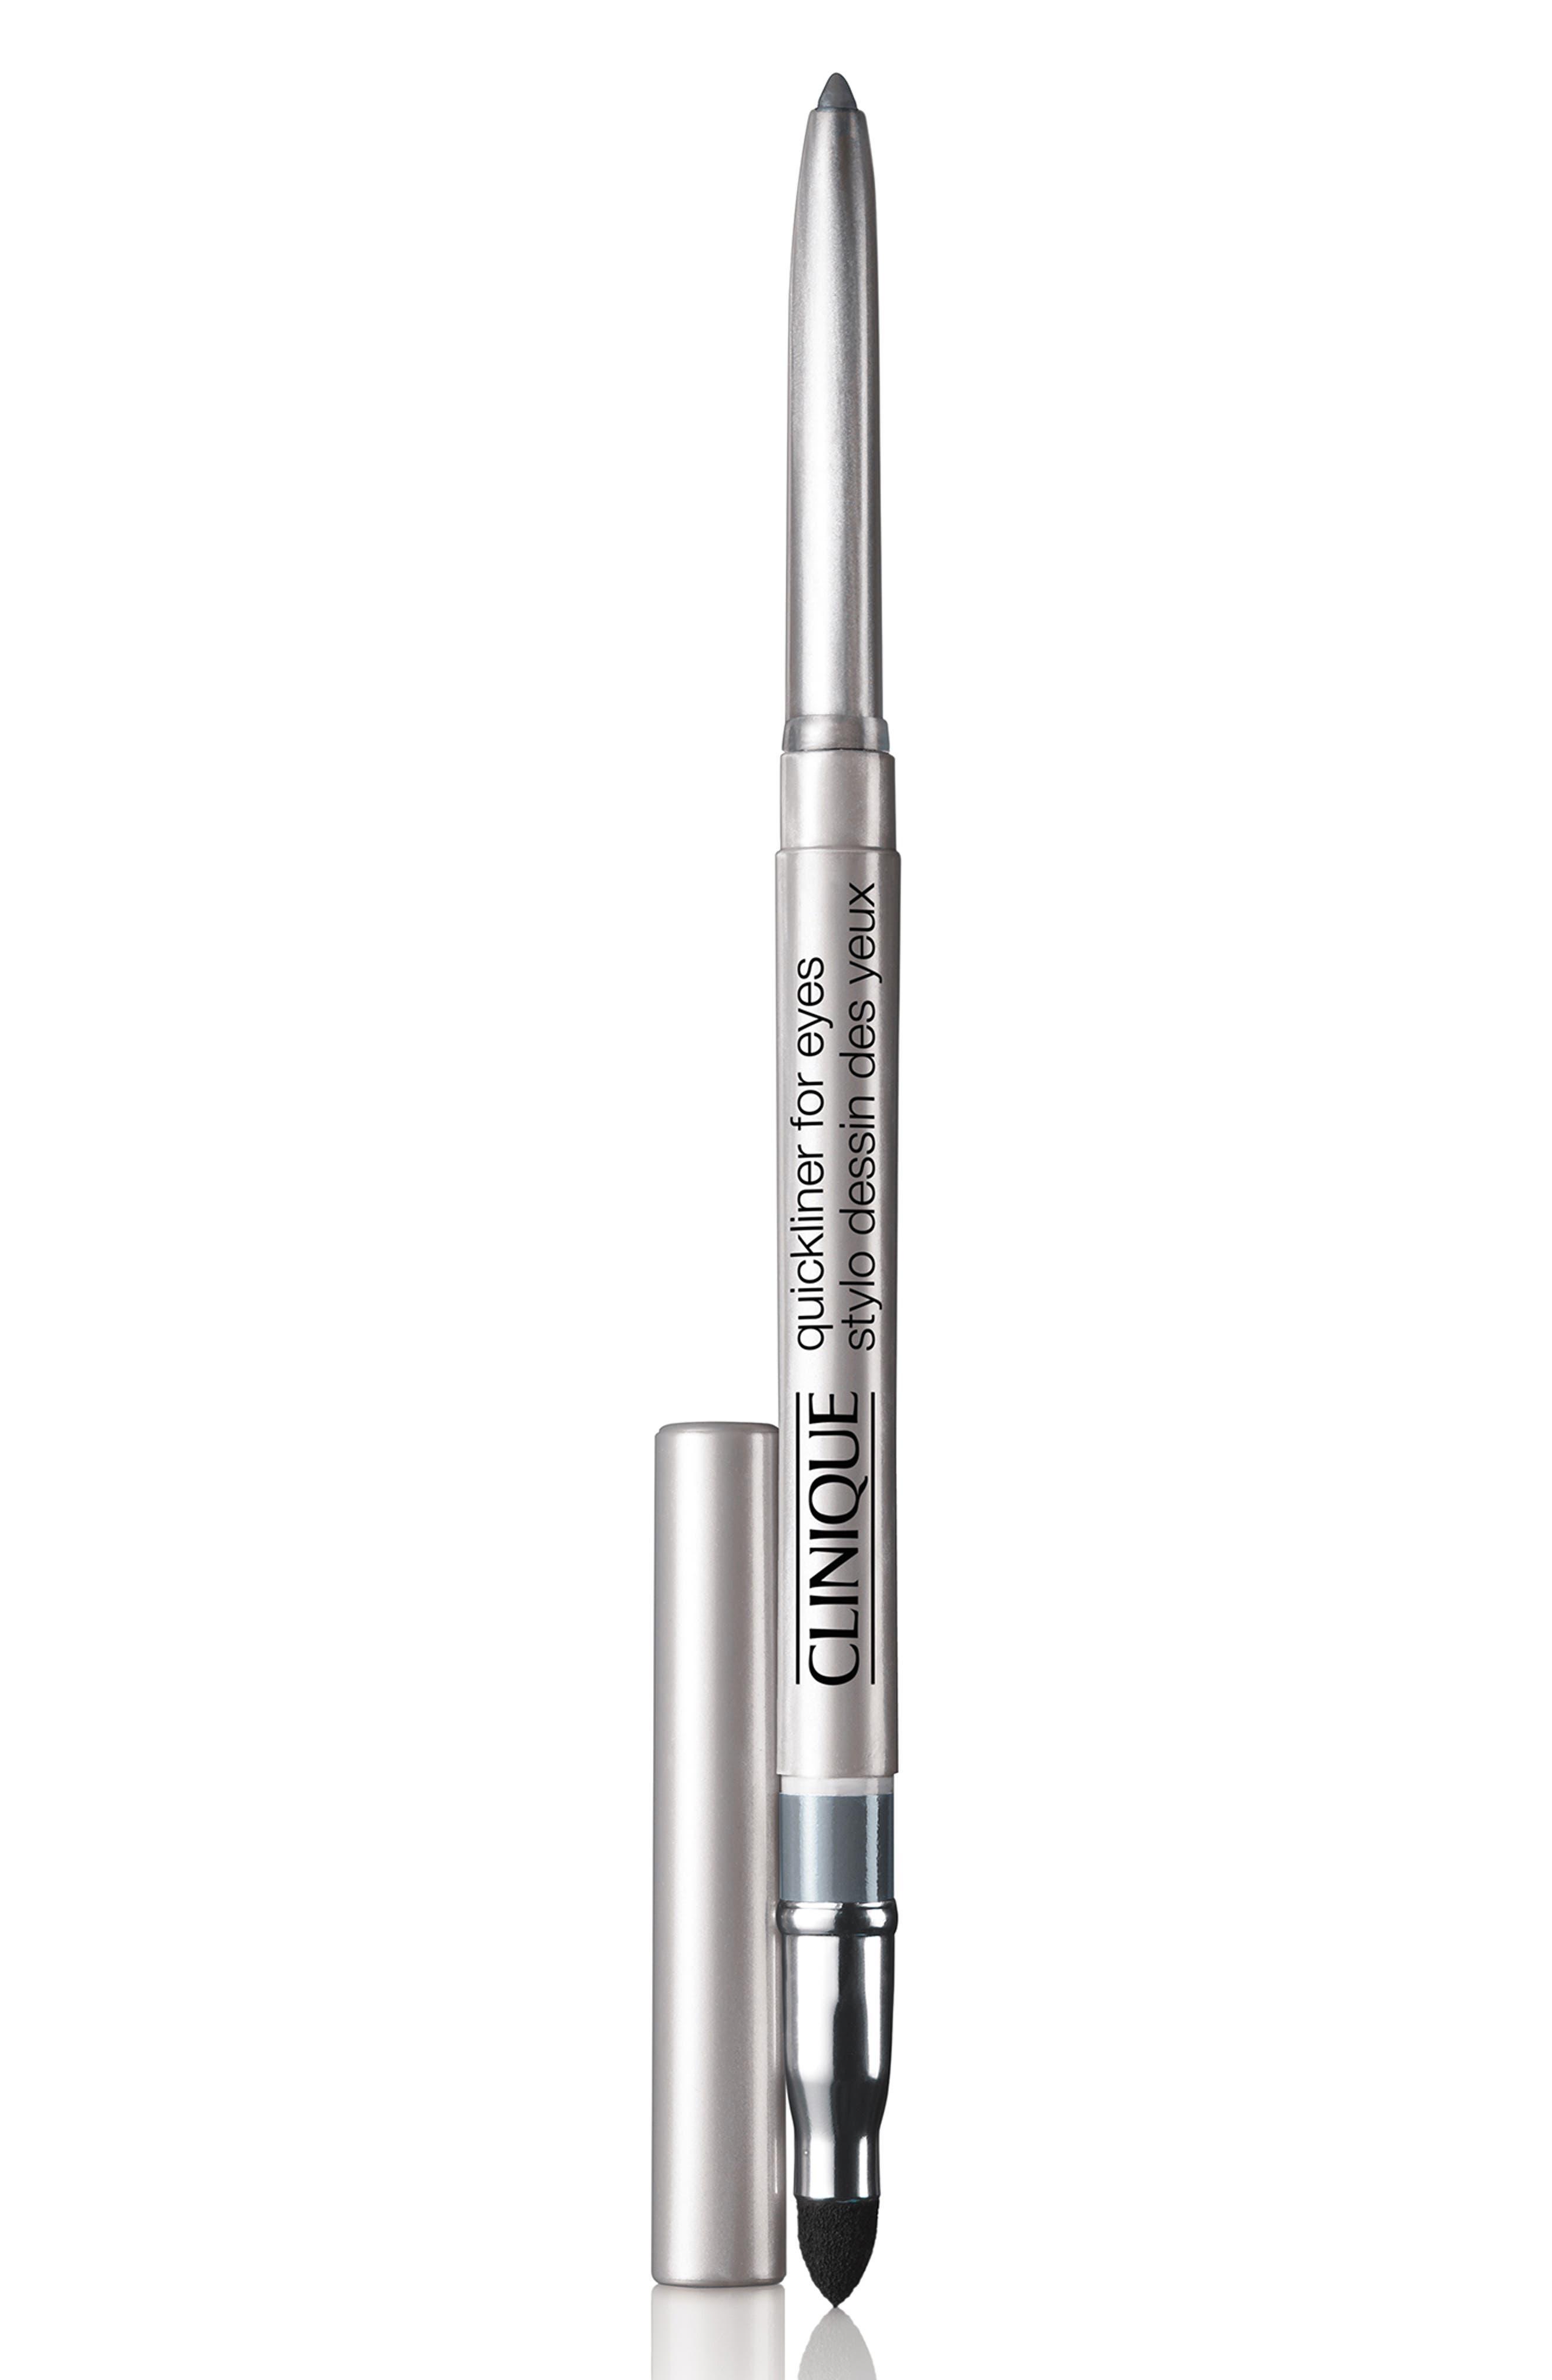 Clinique Quickliner For Eyes Eyeliner Pencil - Slate